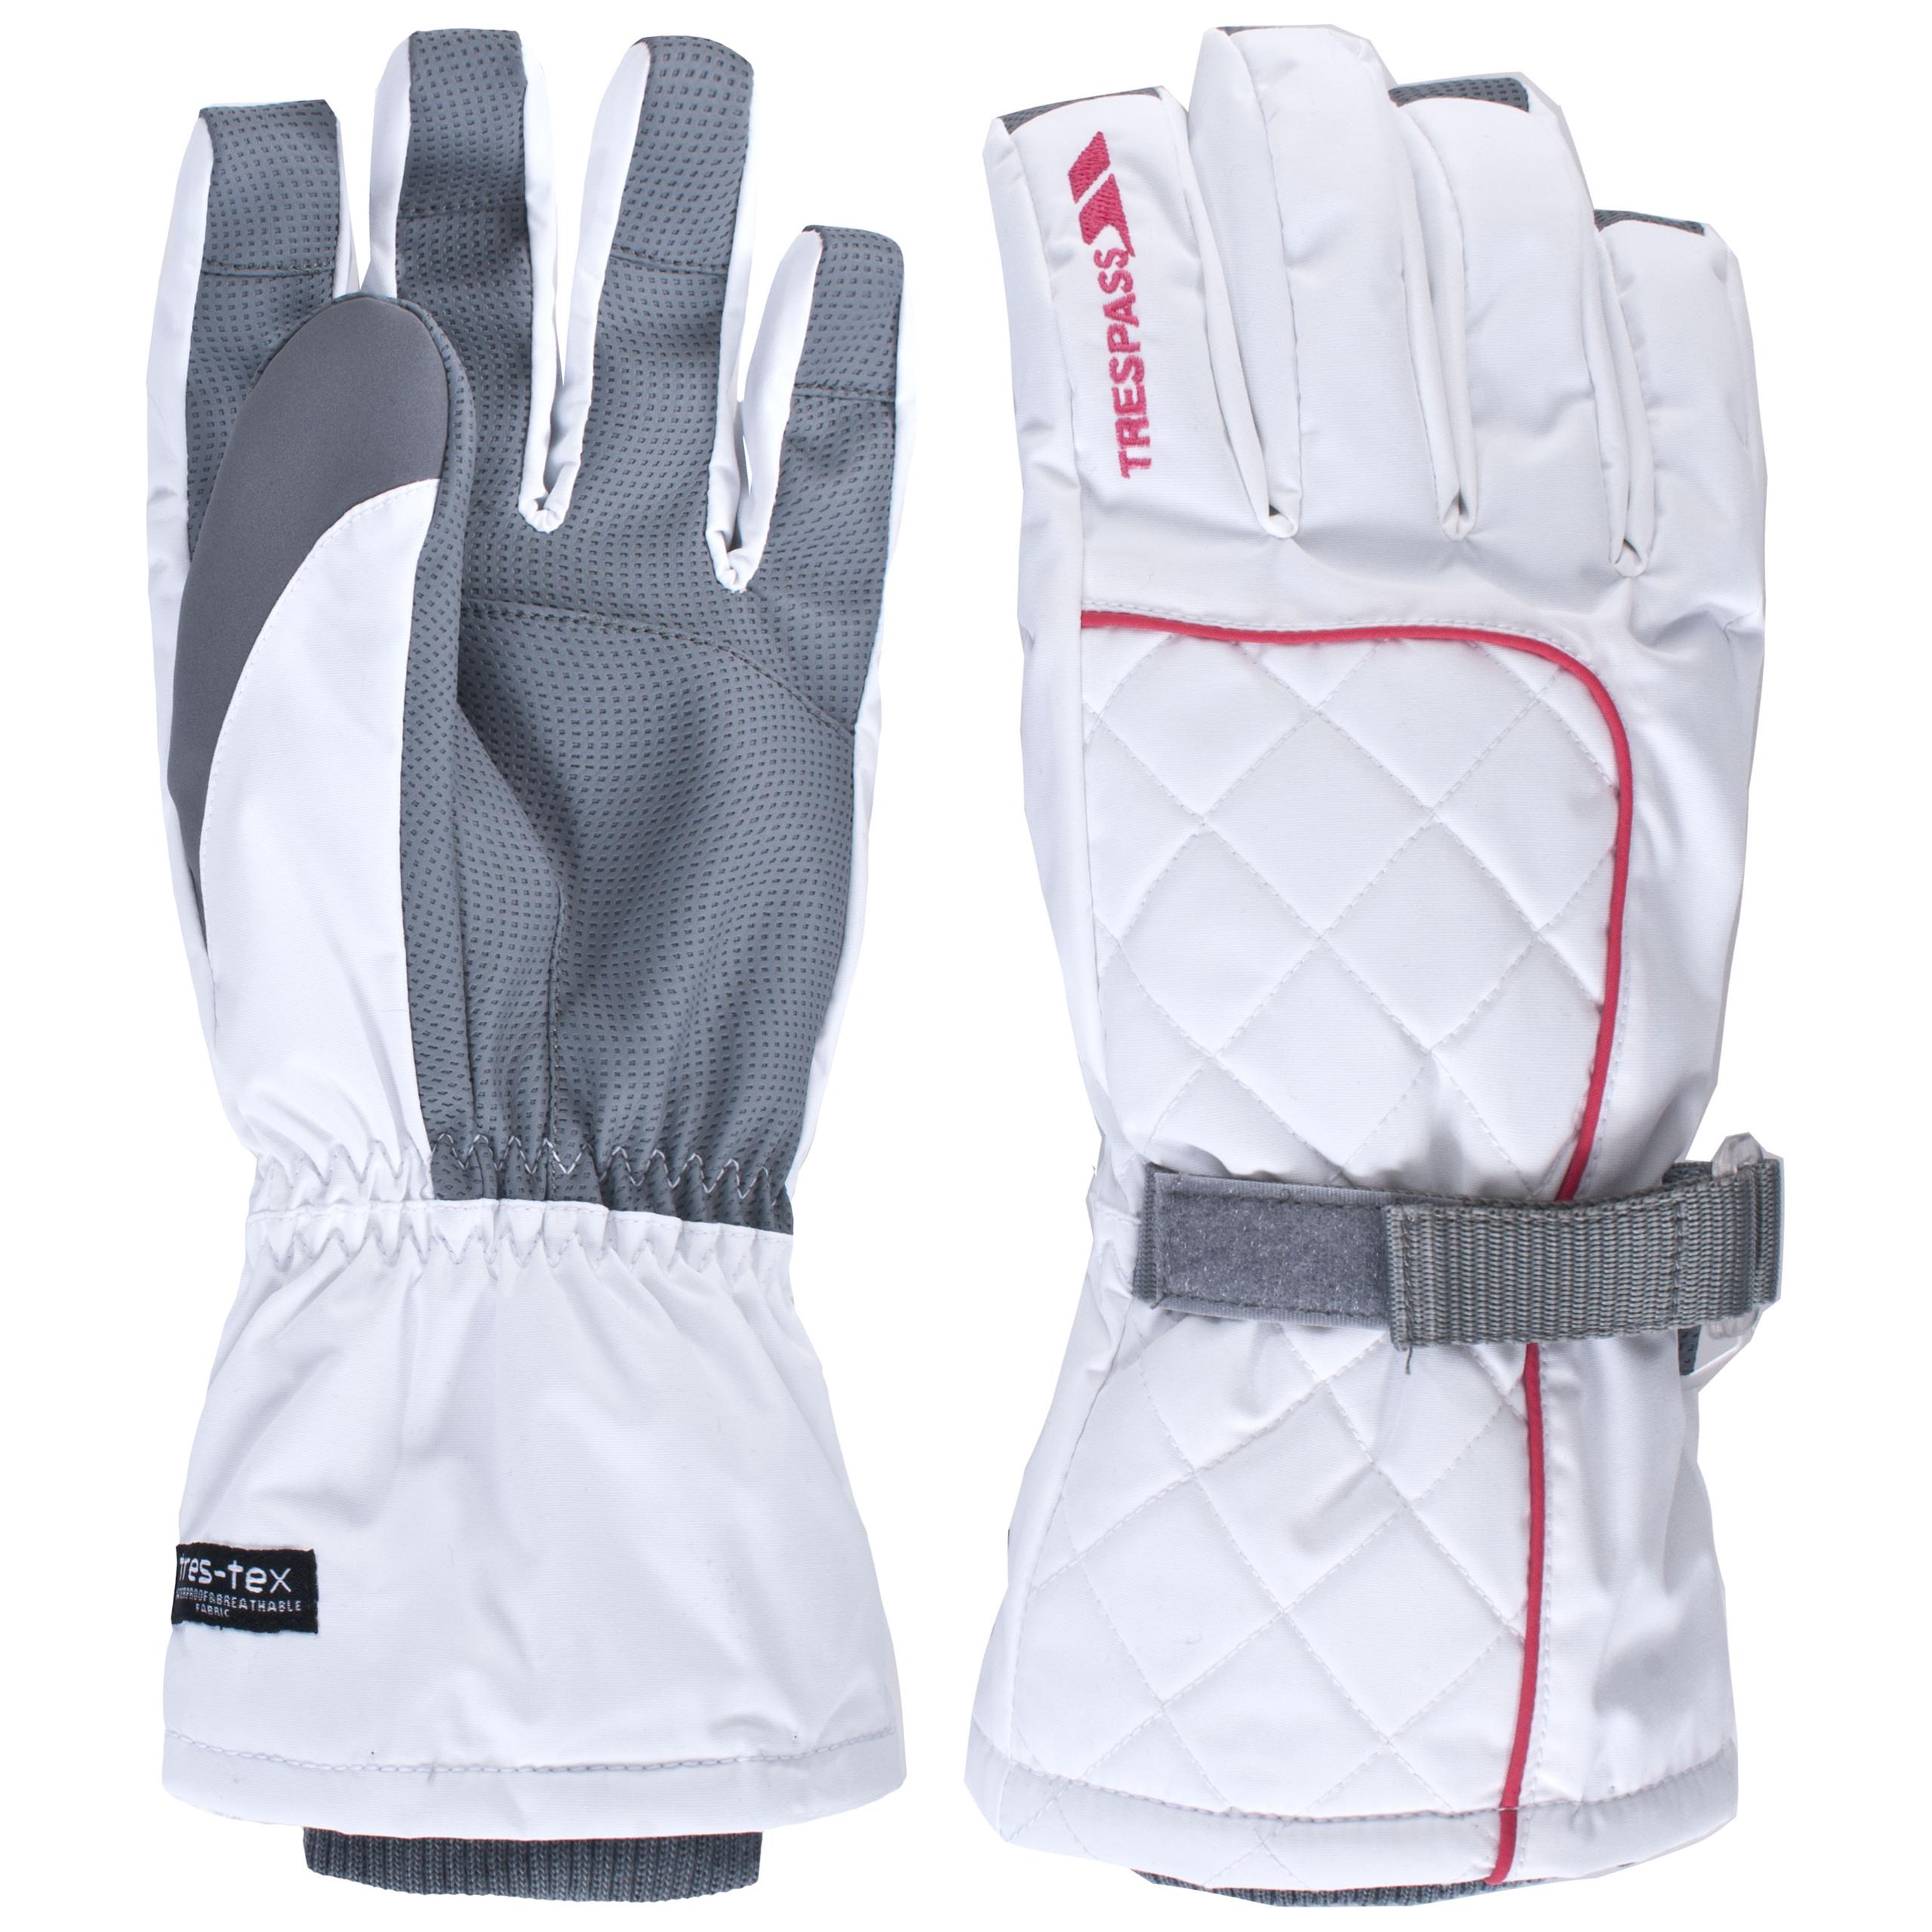 Womens leather ski gloves - Tresp Ranna Womens Las Waterproof Warm Winter Ski Snowboard